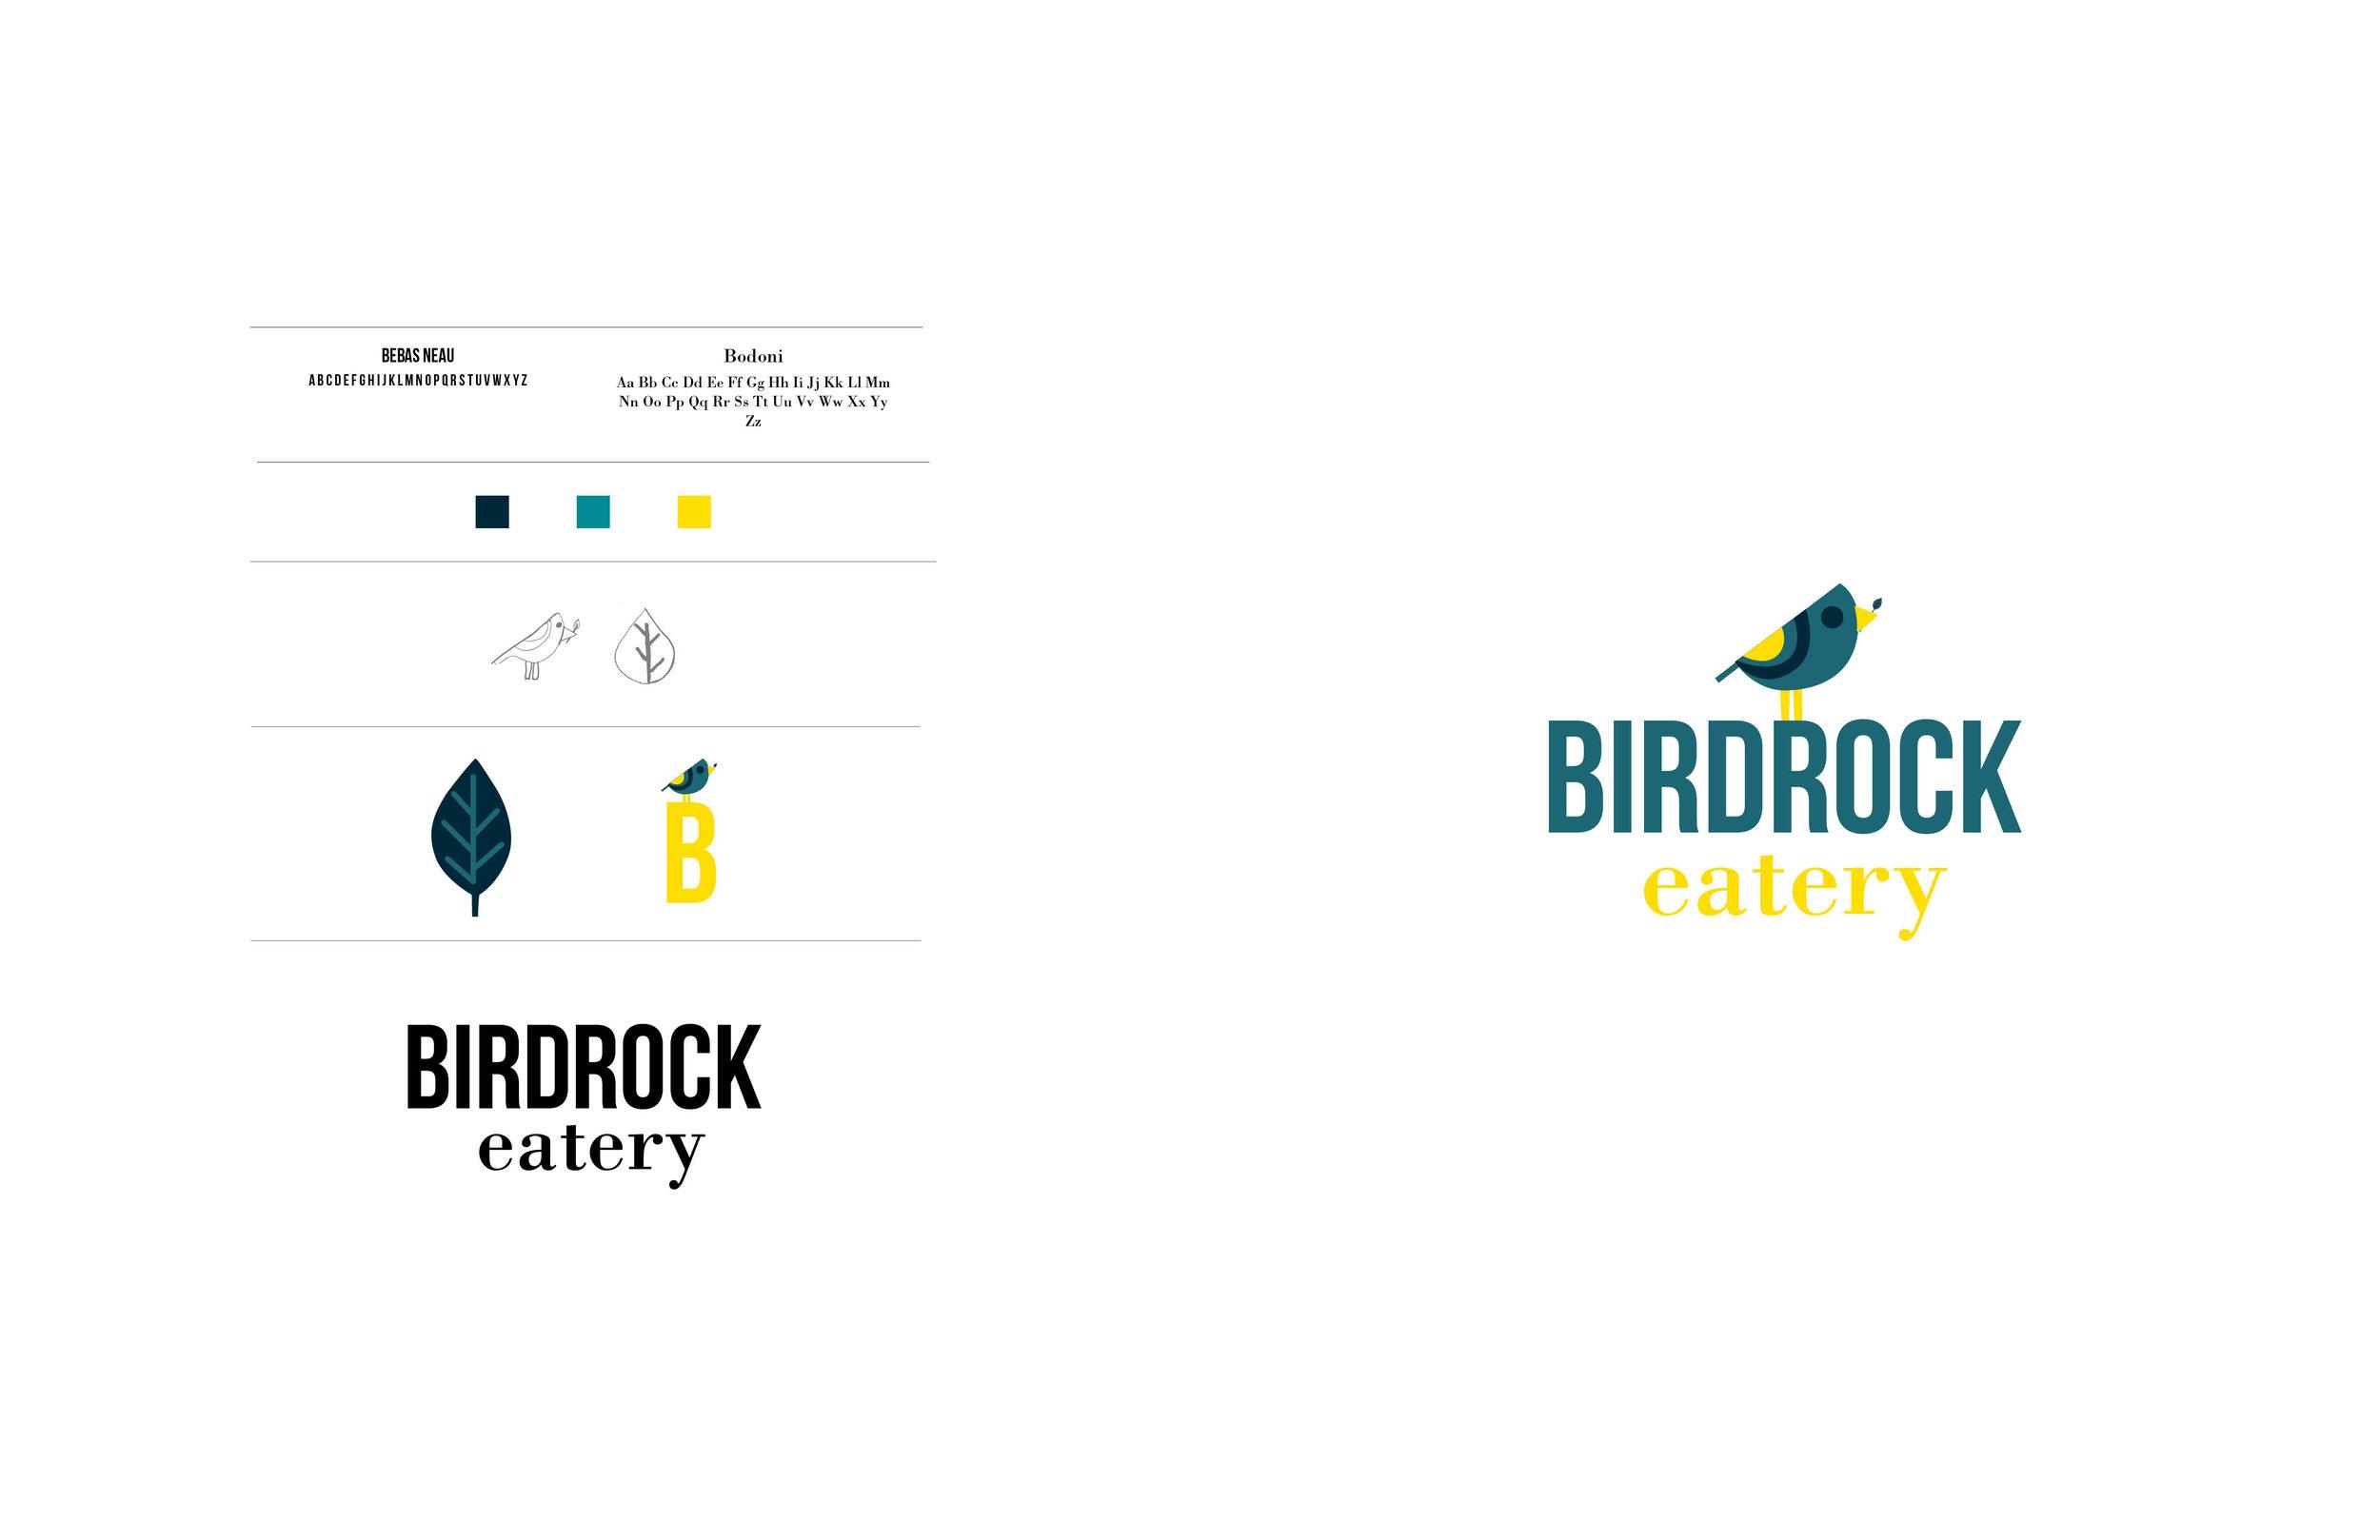 birdrock pages3.jpg